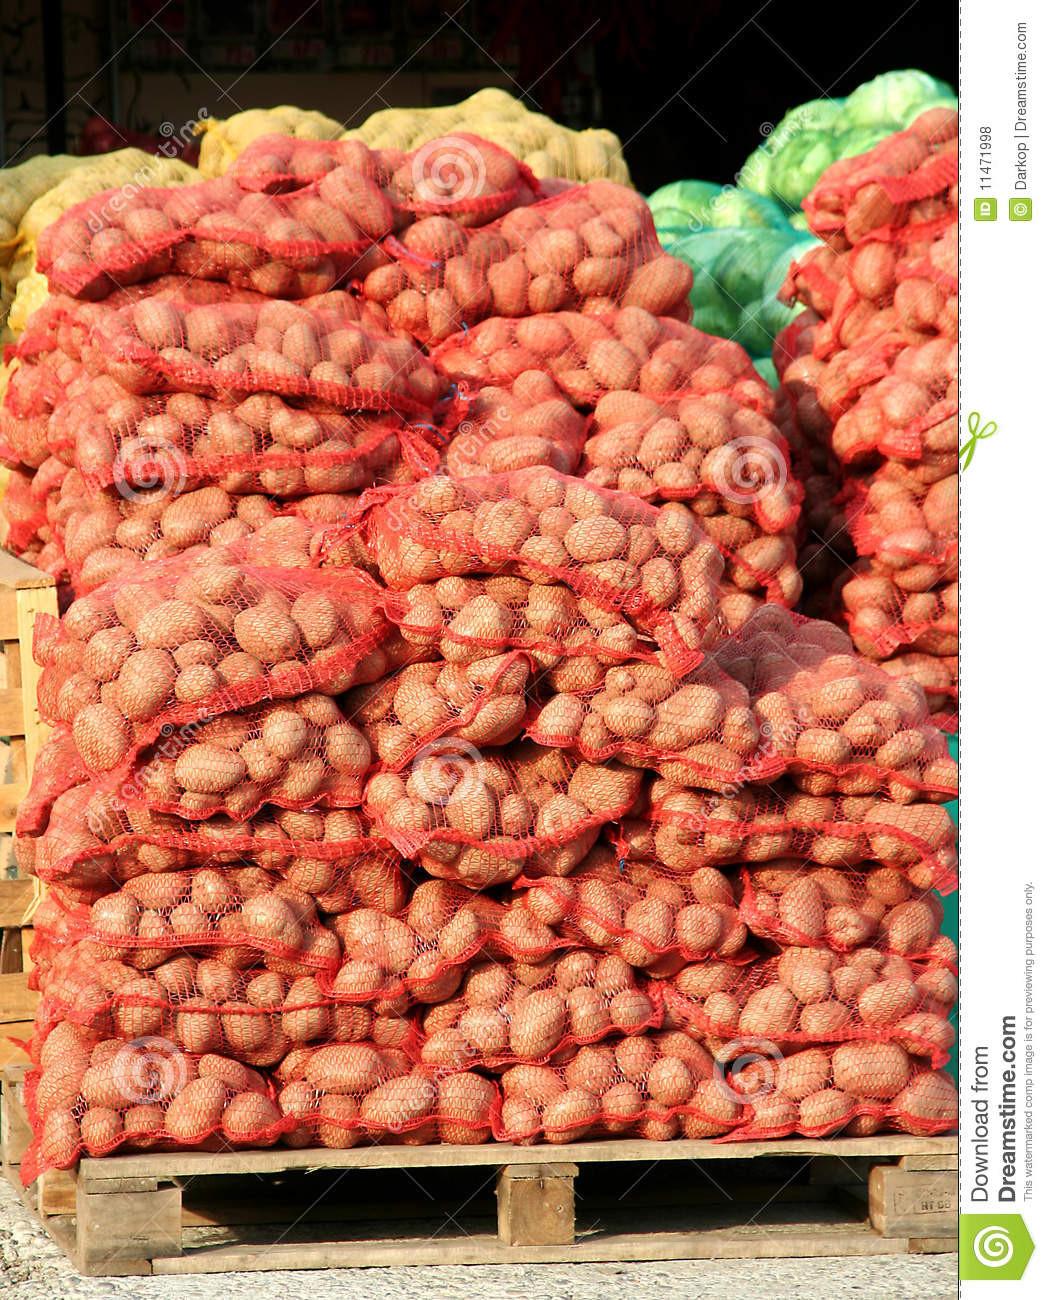 The Potato Place  Potato Royalty Free Stock s Image